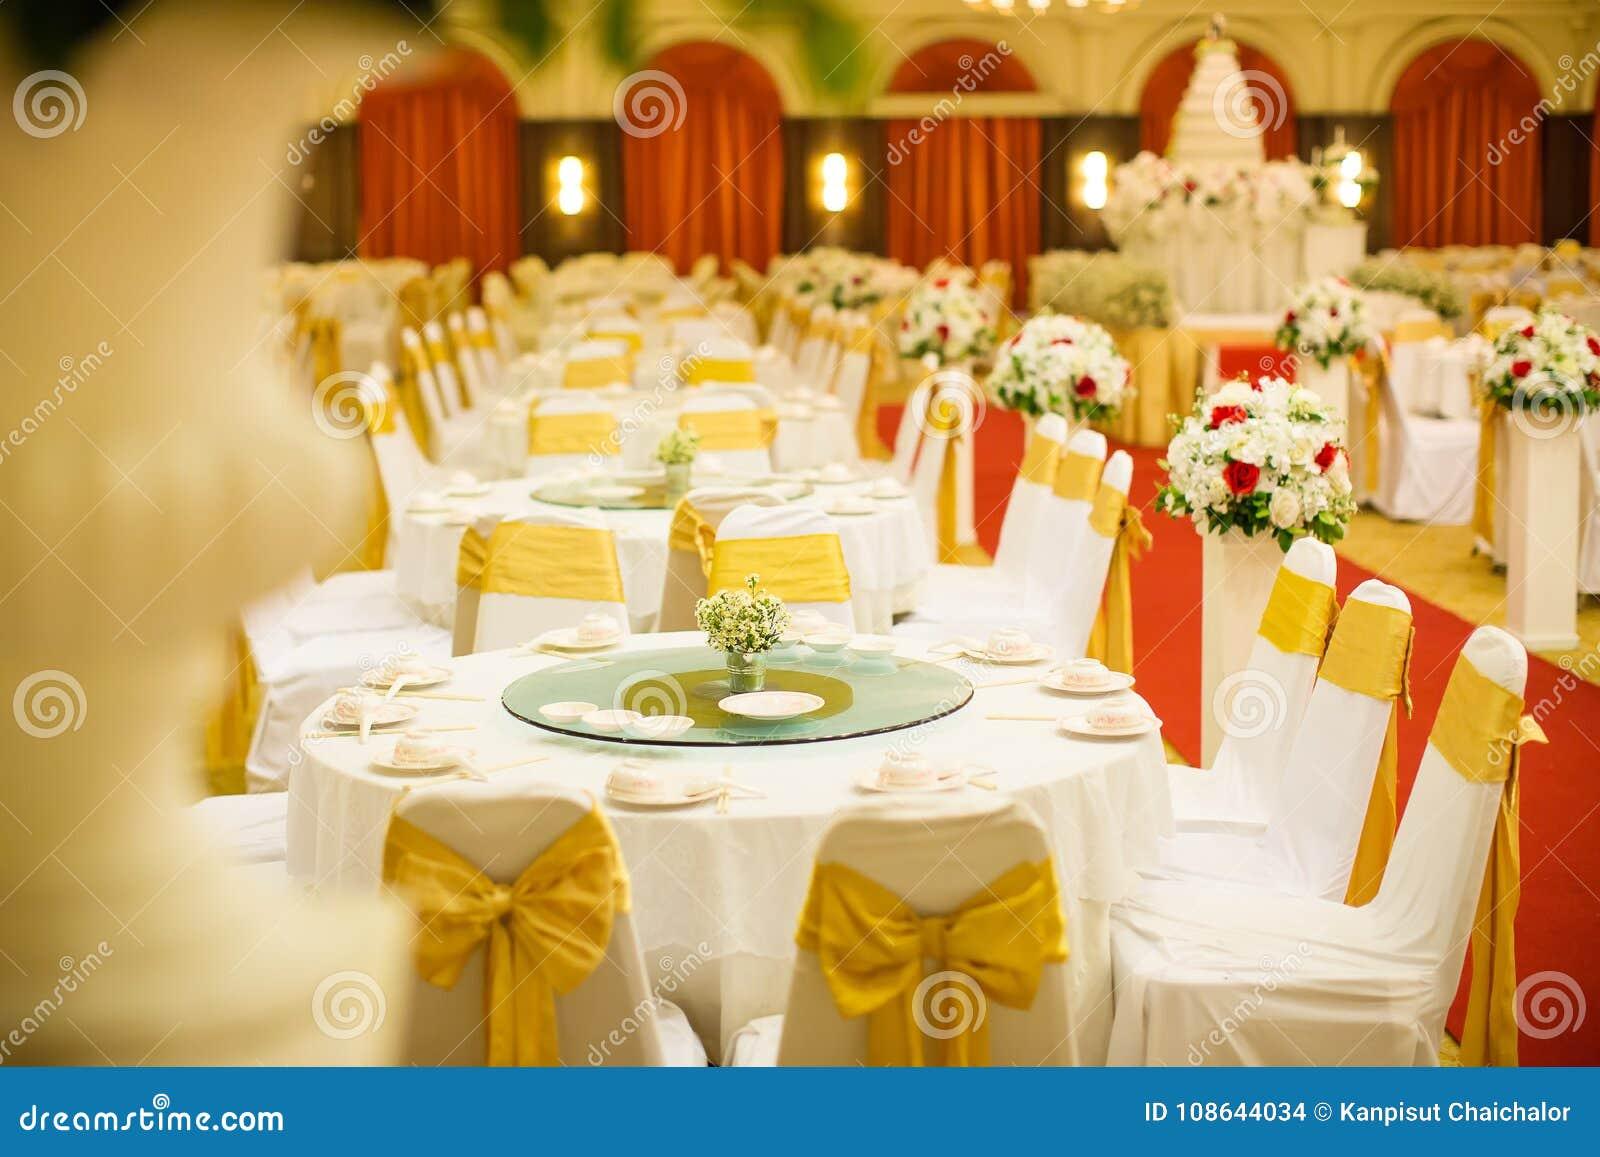 Wedding Table Sets In Wedding Hall. Wedding Decorate Preparation ...